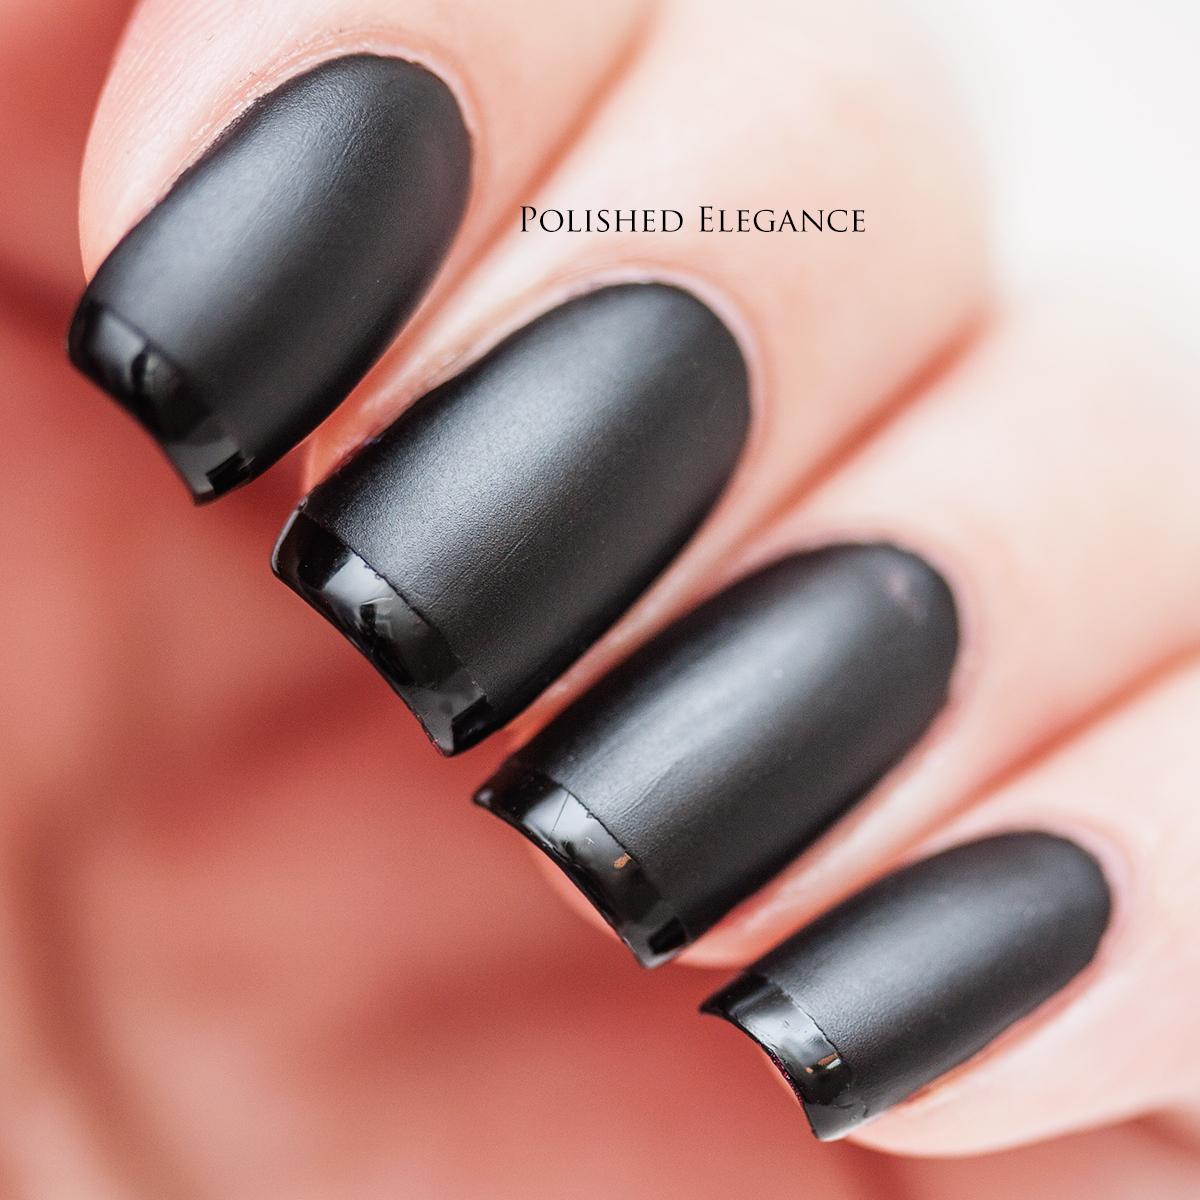 Polished Elegance: Glossy tips